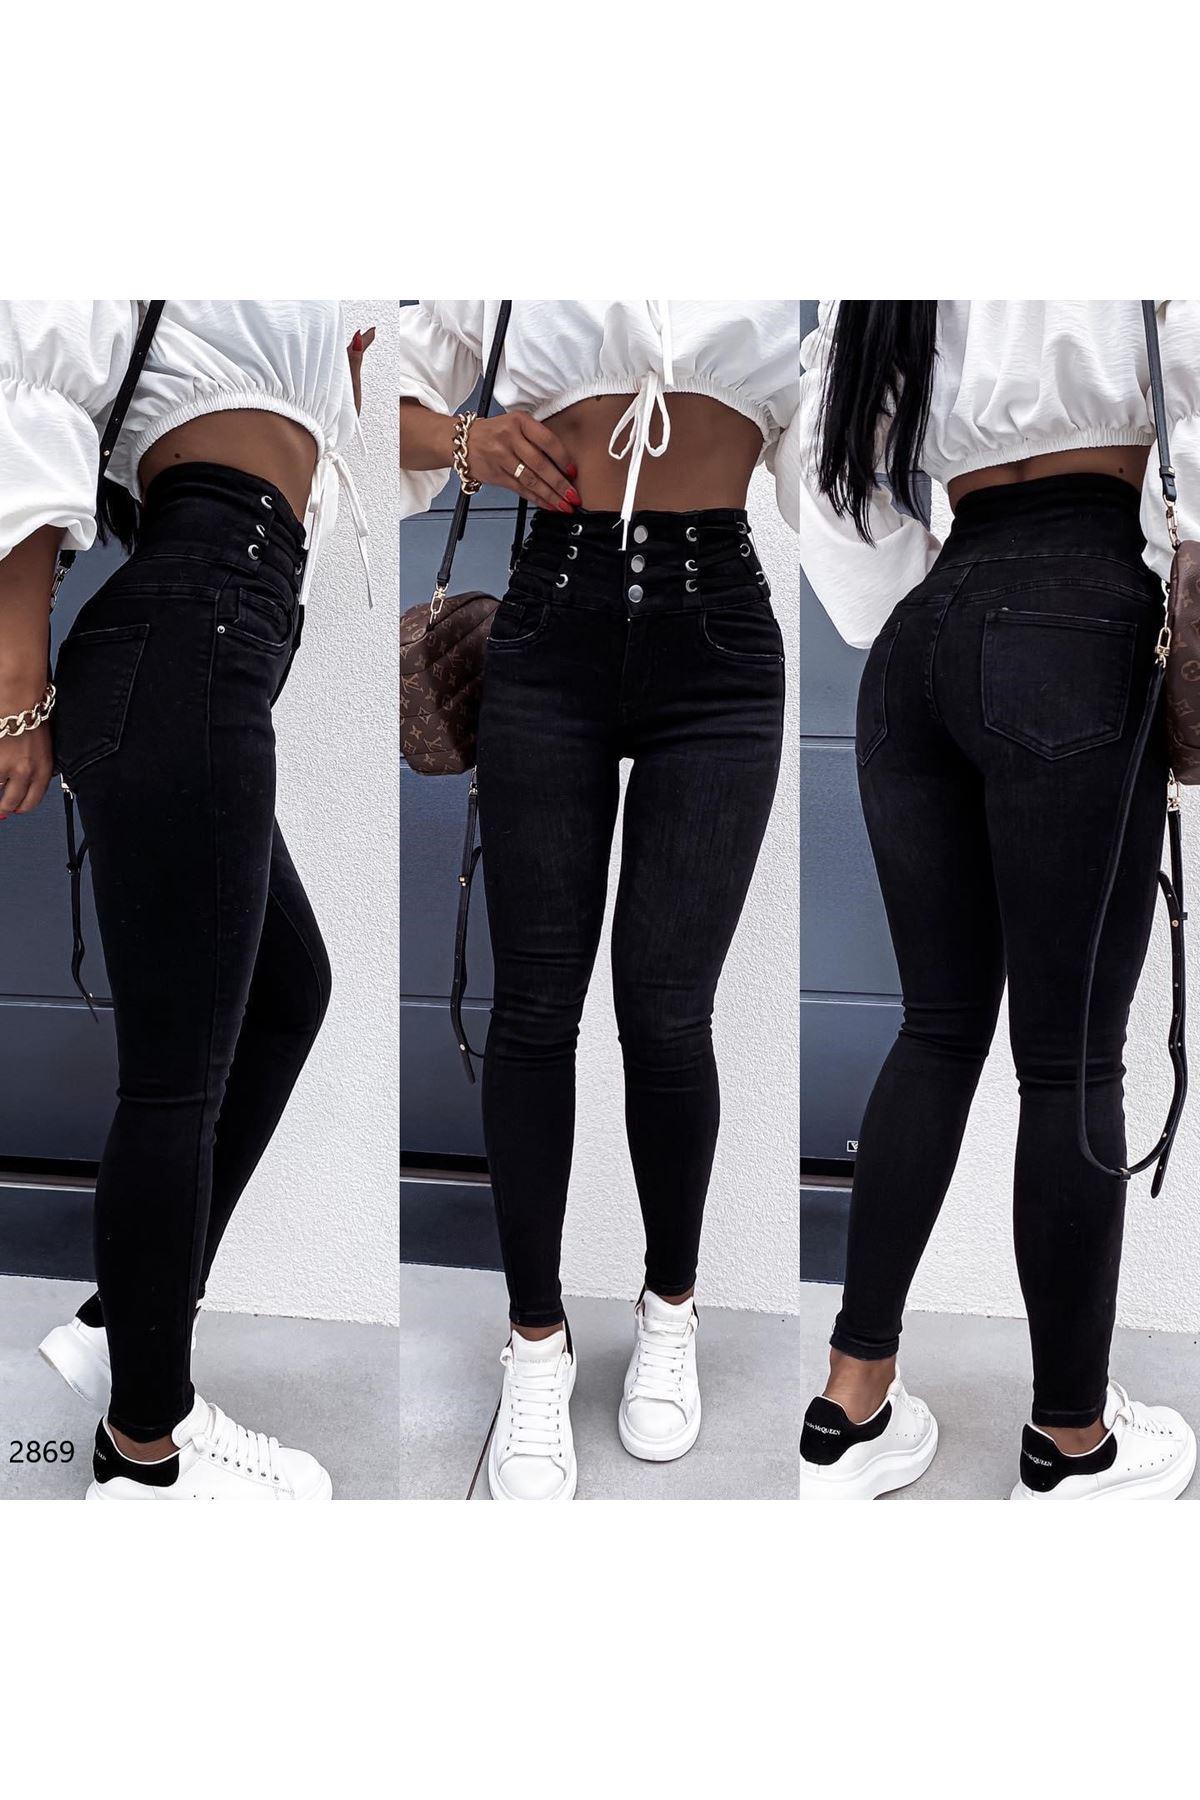 Yüksek Bel Lastikli Pantolon - SİYAH